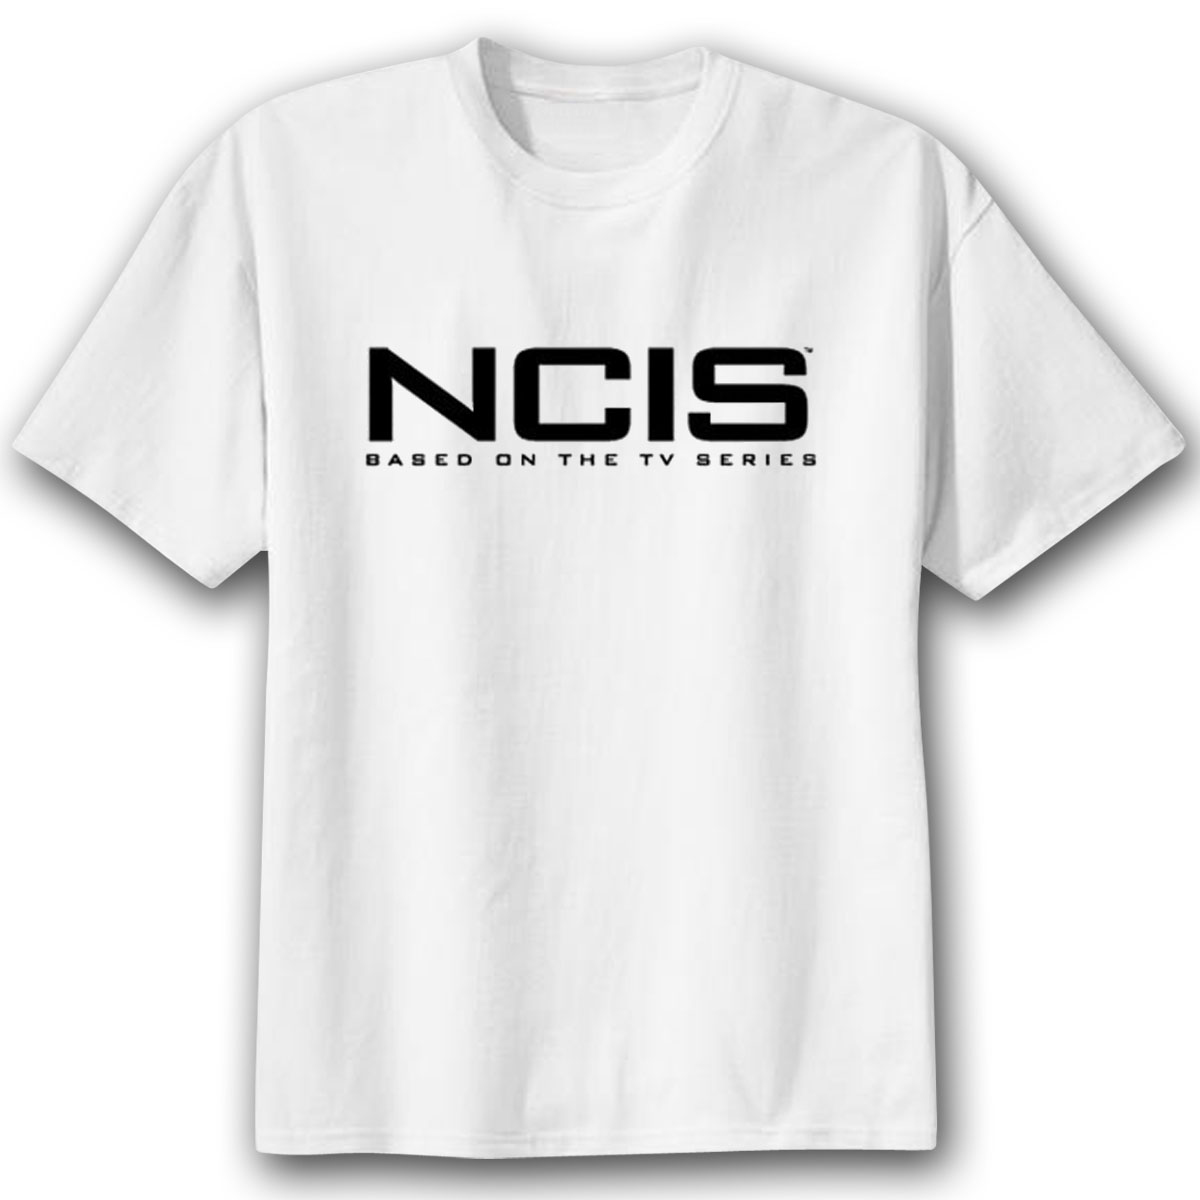 NCIS Logo T-shirt - White